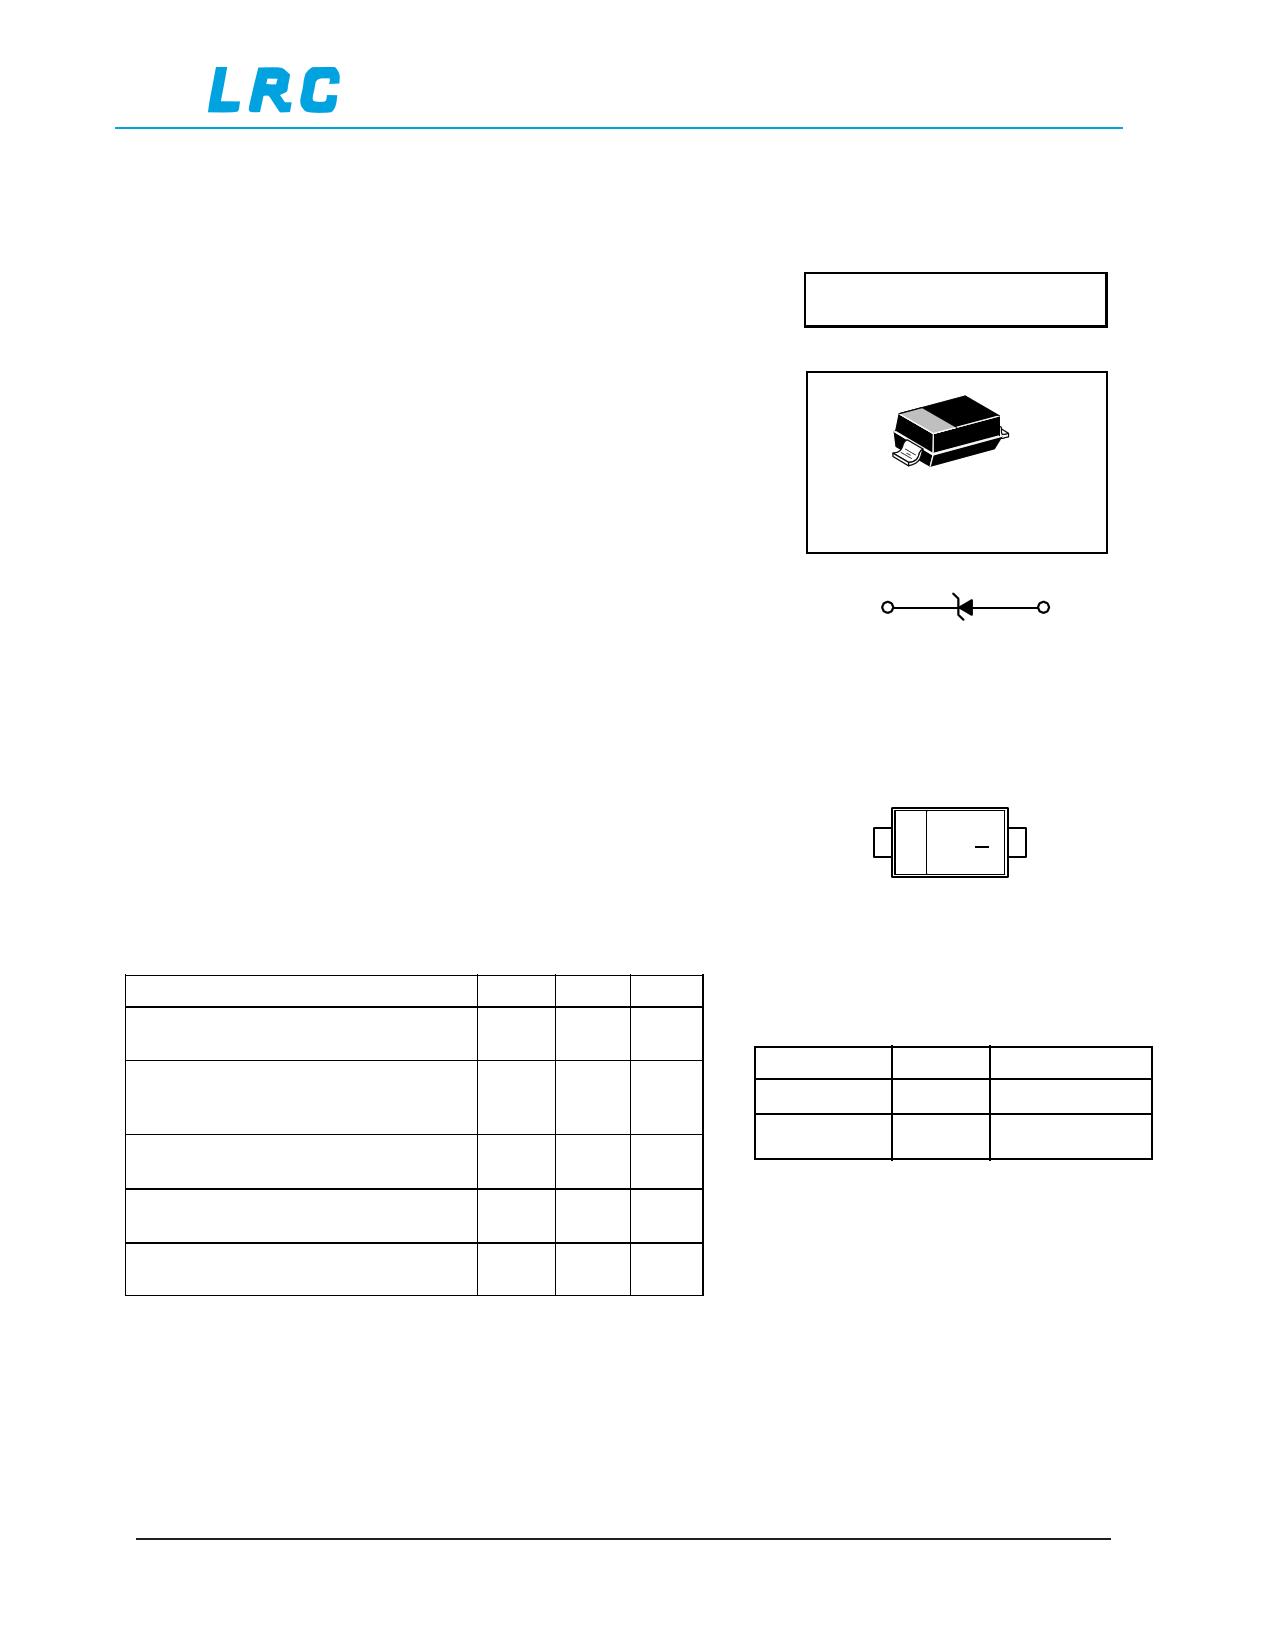 LMSZ4693ET1G datasheet, circuit